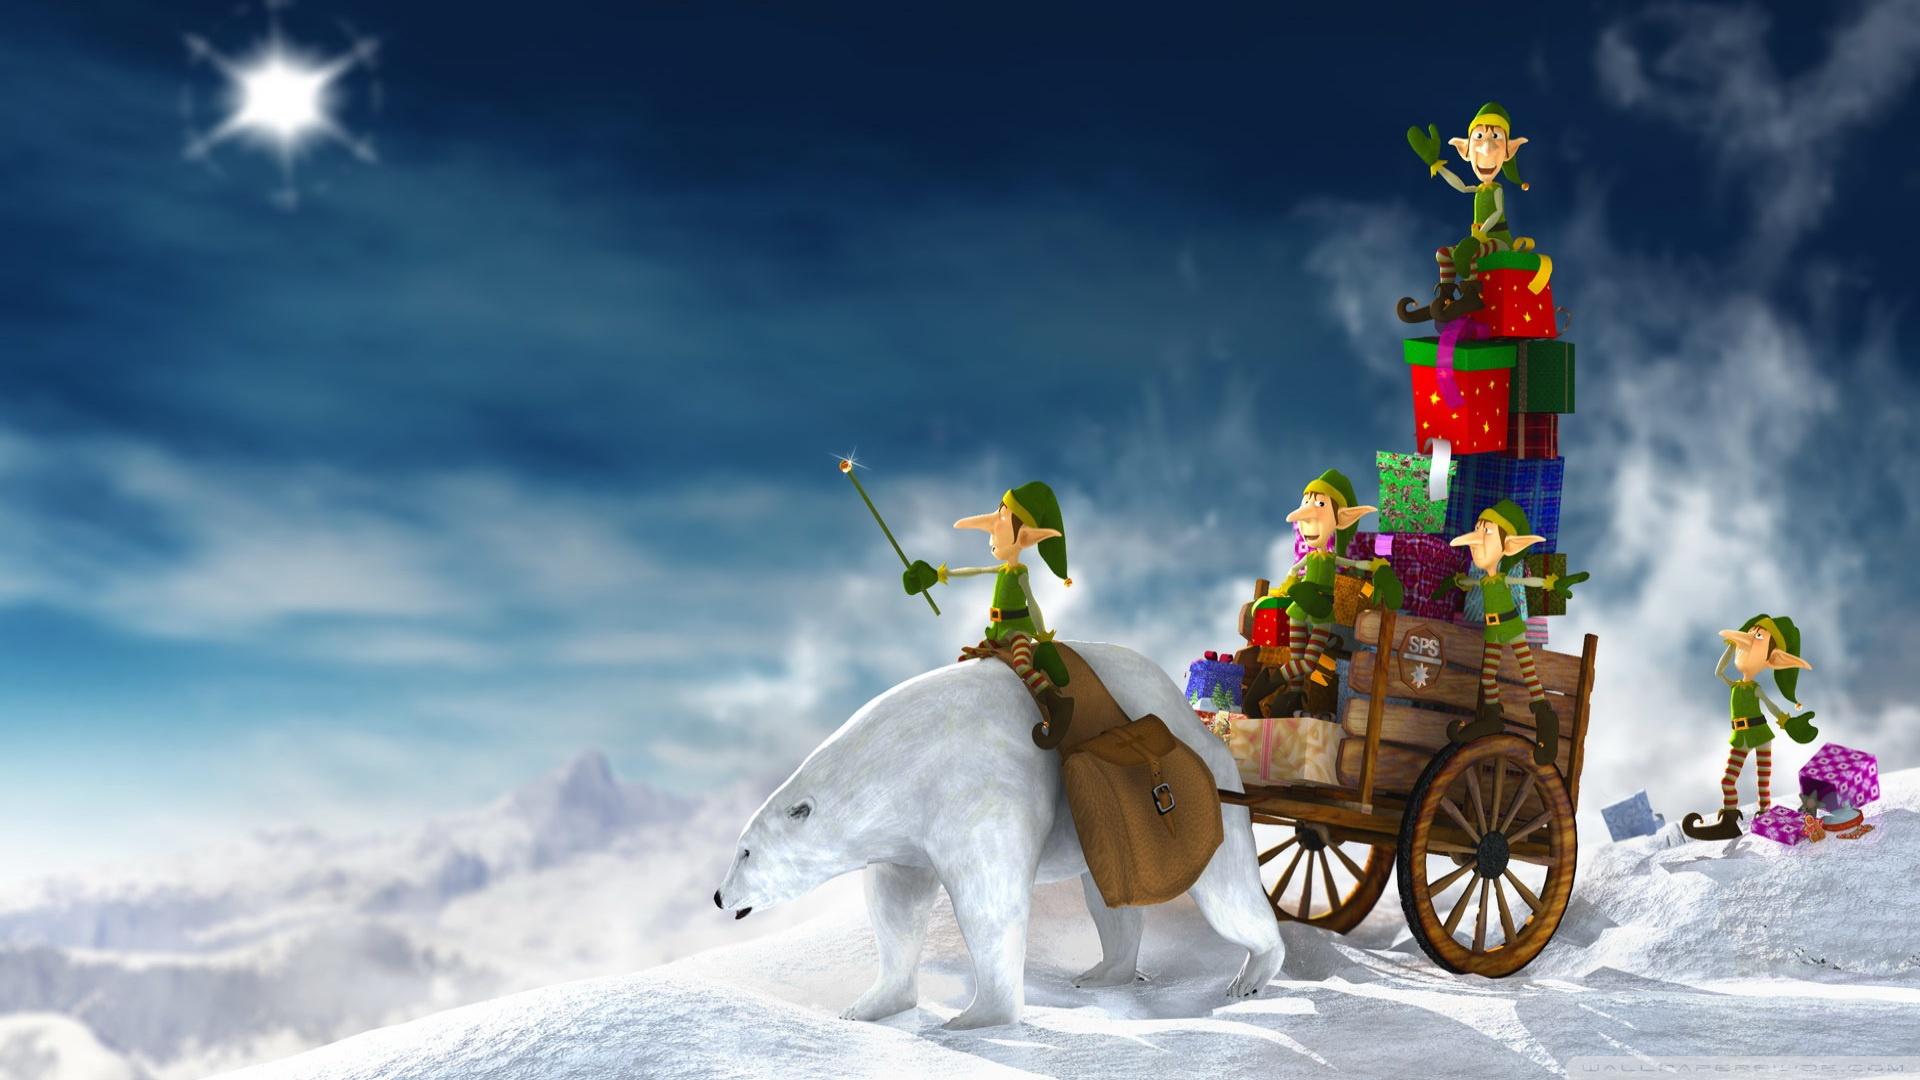 Christmas Elves 3D 4K HD Desktop Wallpaper for 4K Ultra HD TV 1920x1080